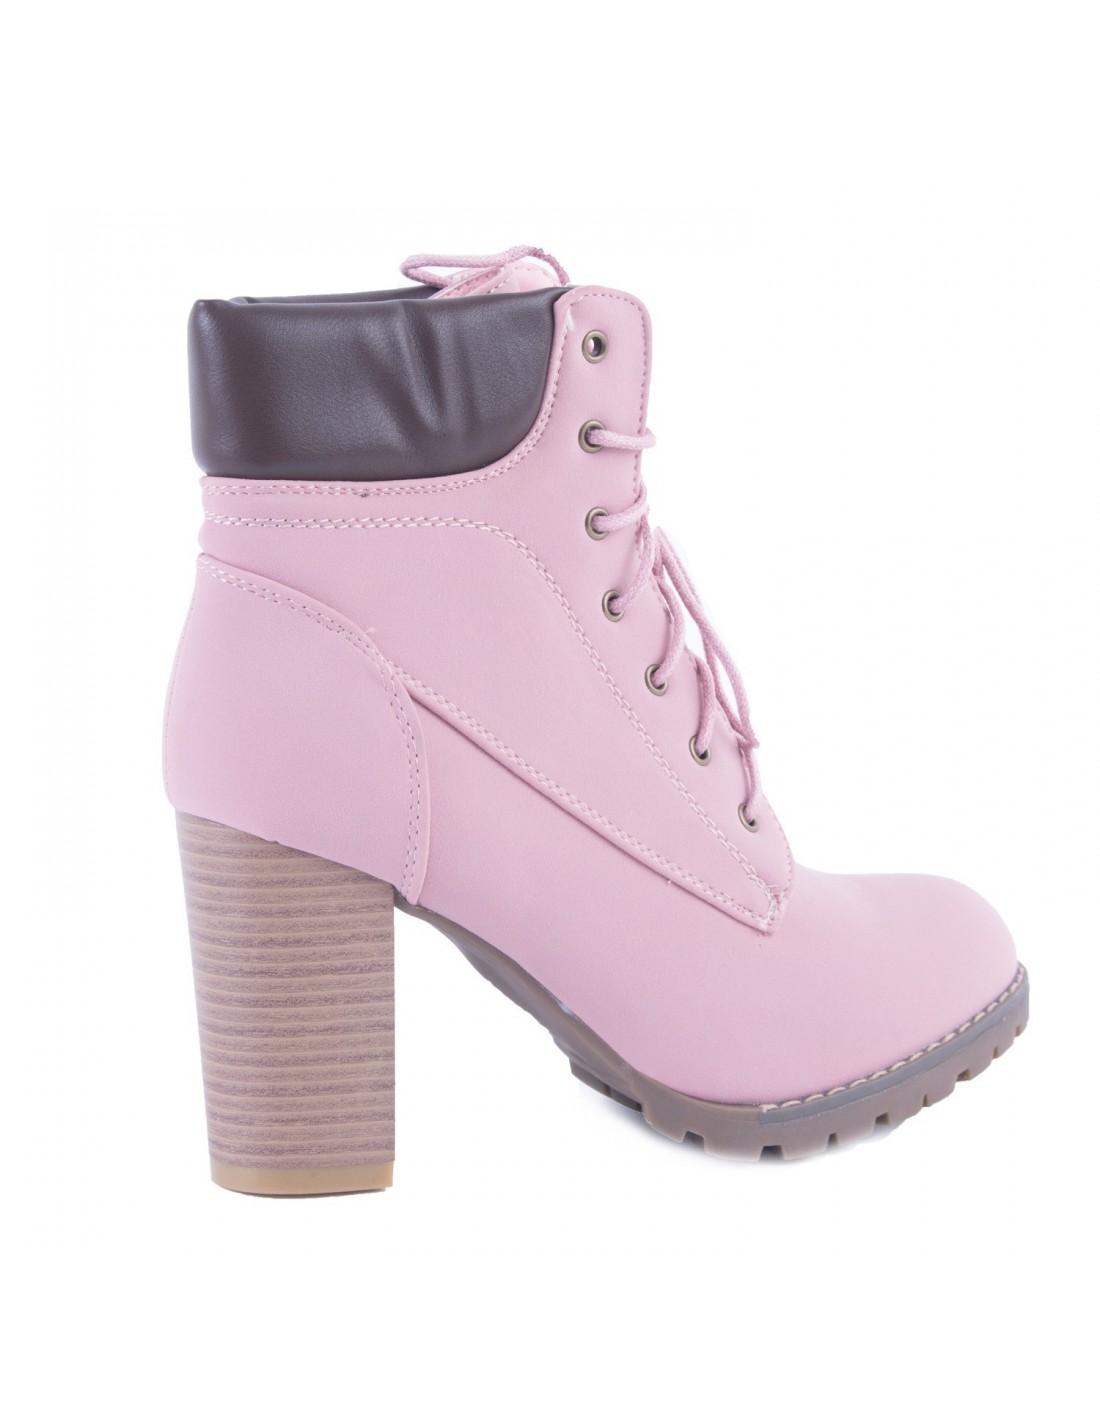 official photos 08de7 12e43 boots-femme-rangers-a-talon-epais-camel-ou-noir.jpg